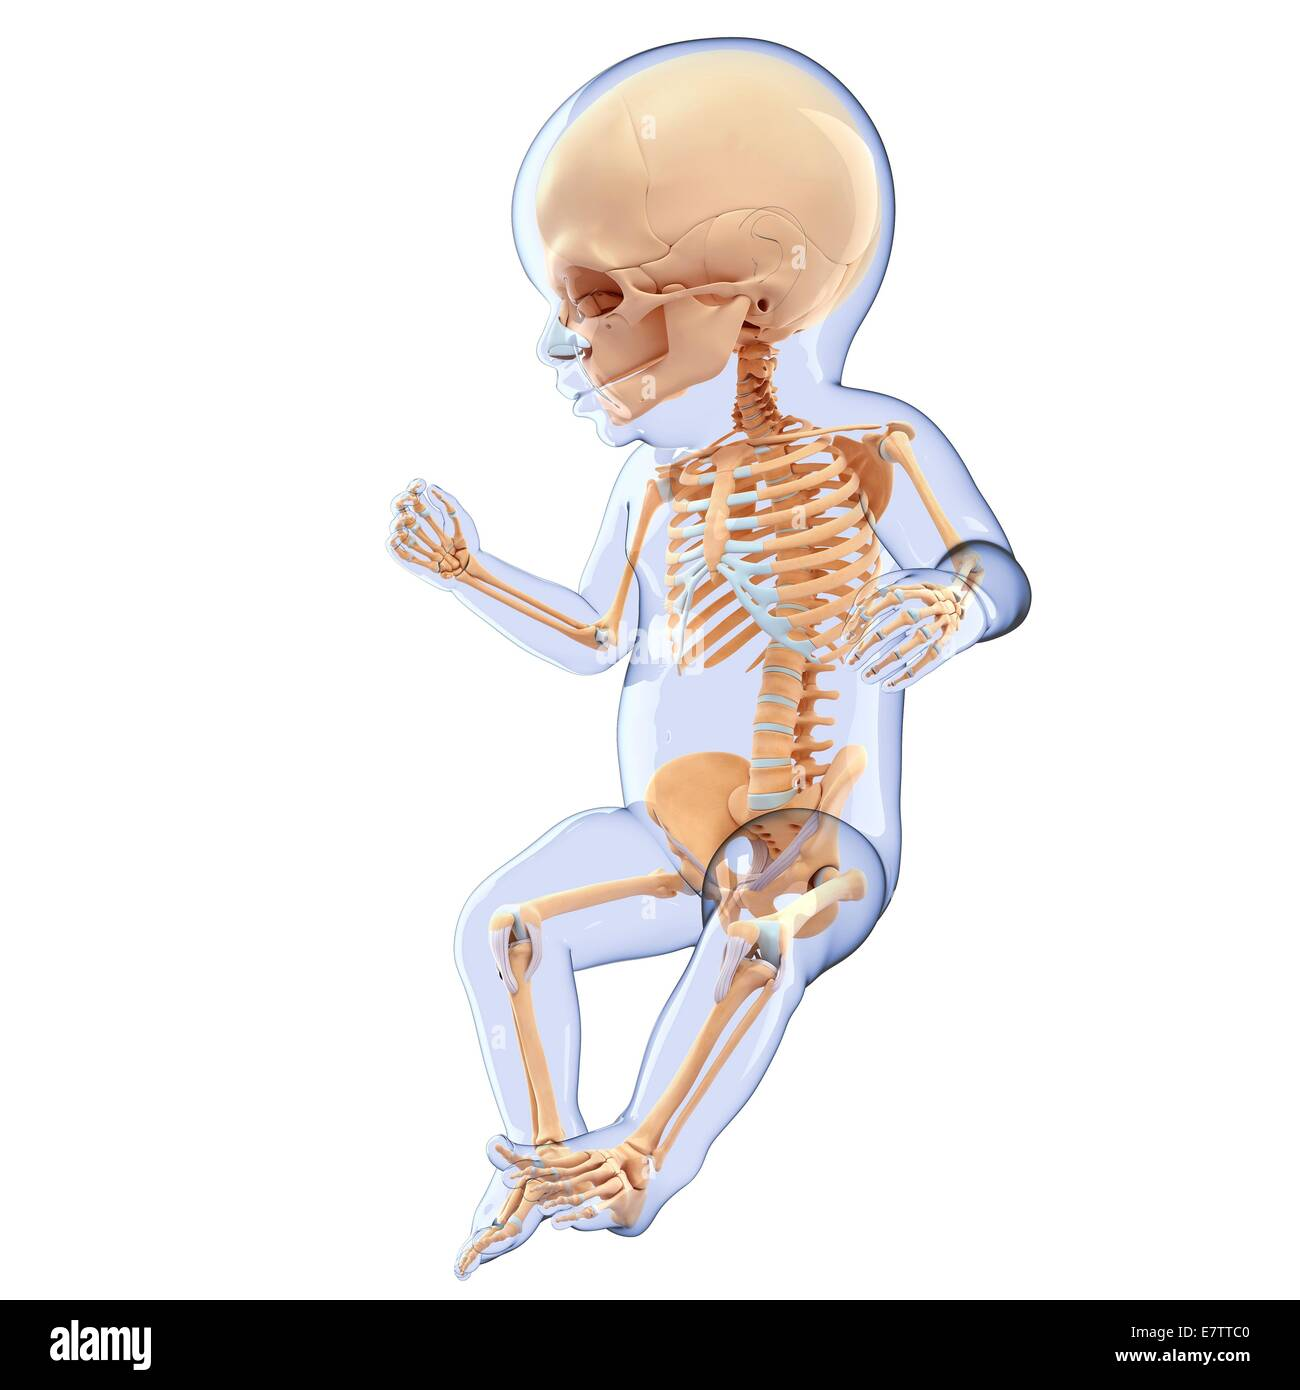 Babys-Skelett-System, Computer-Grafik Stockfoto, Bild: 73690064 - Alamy